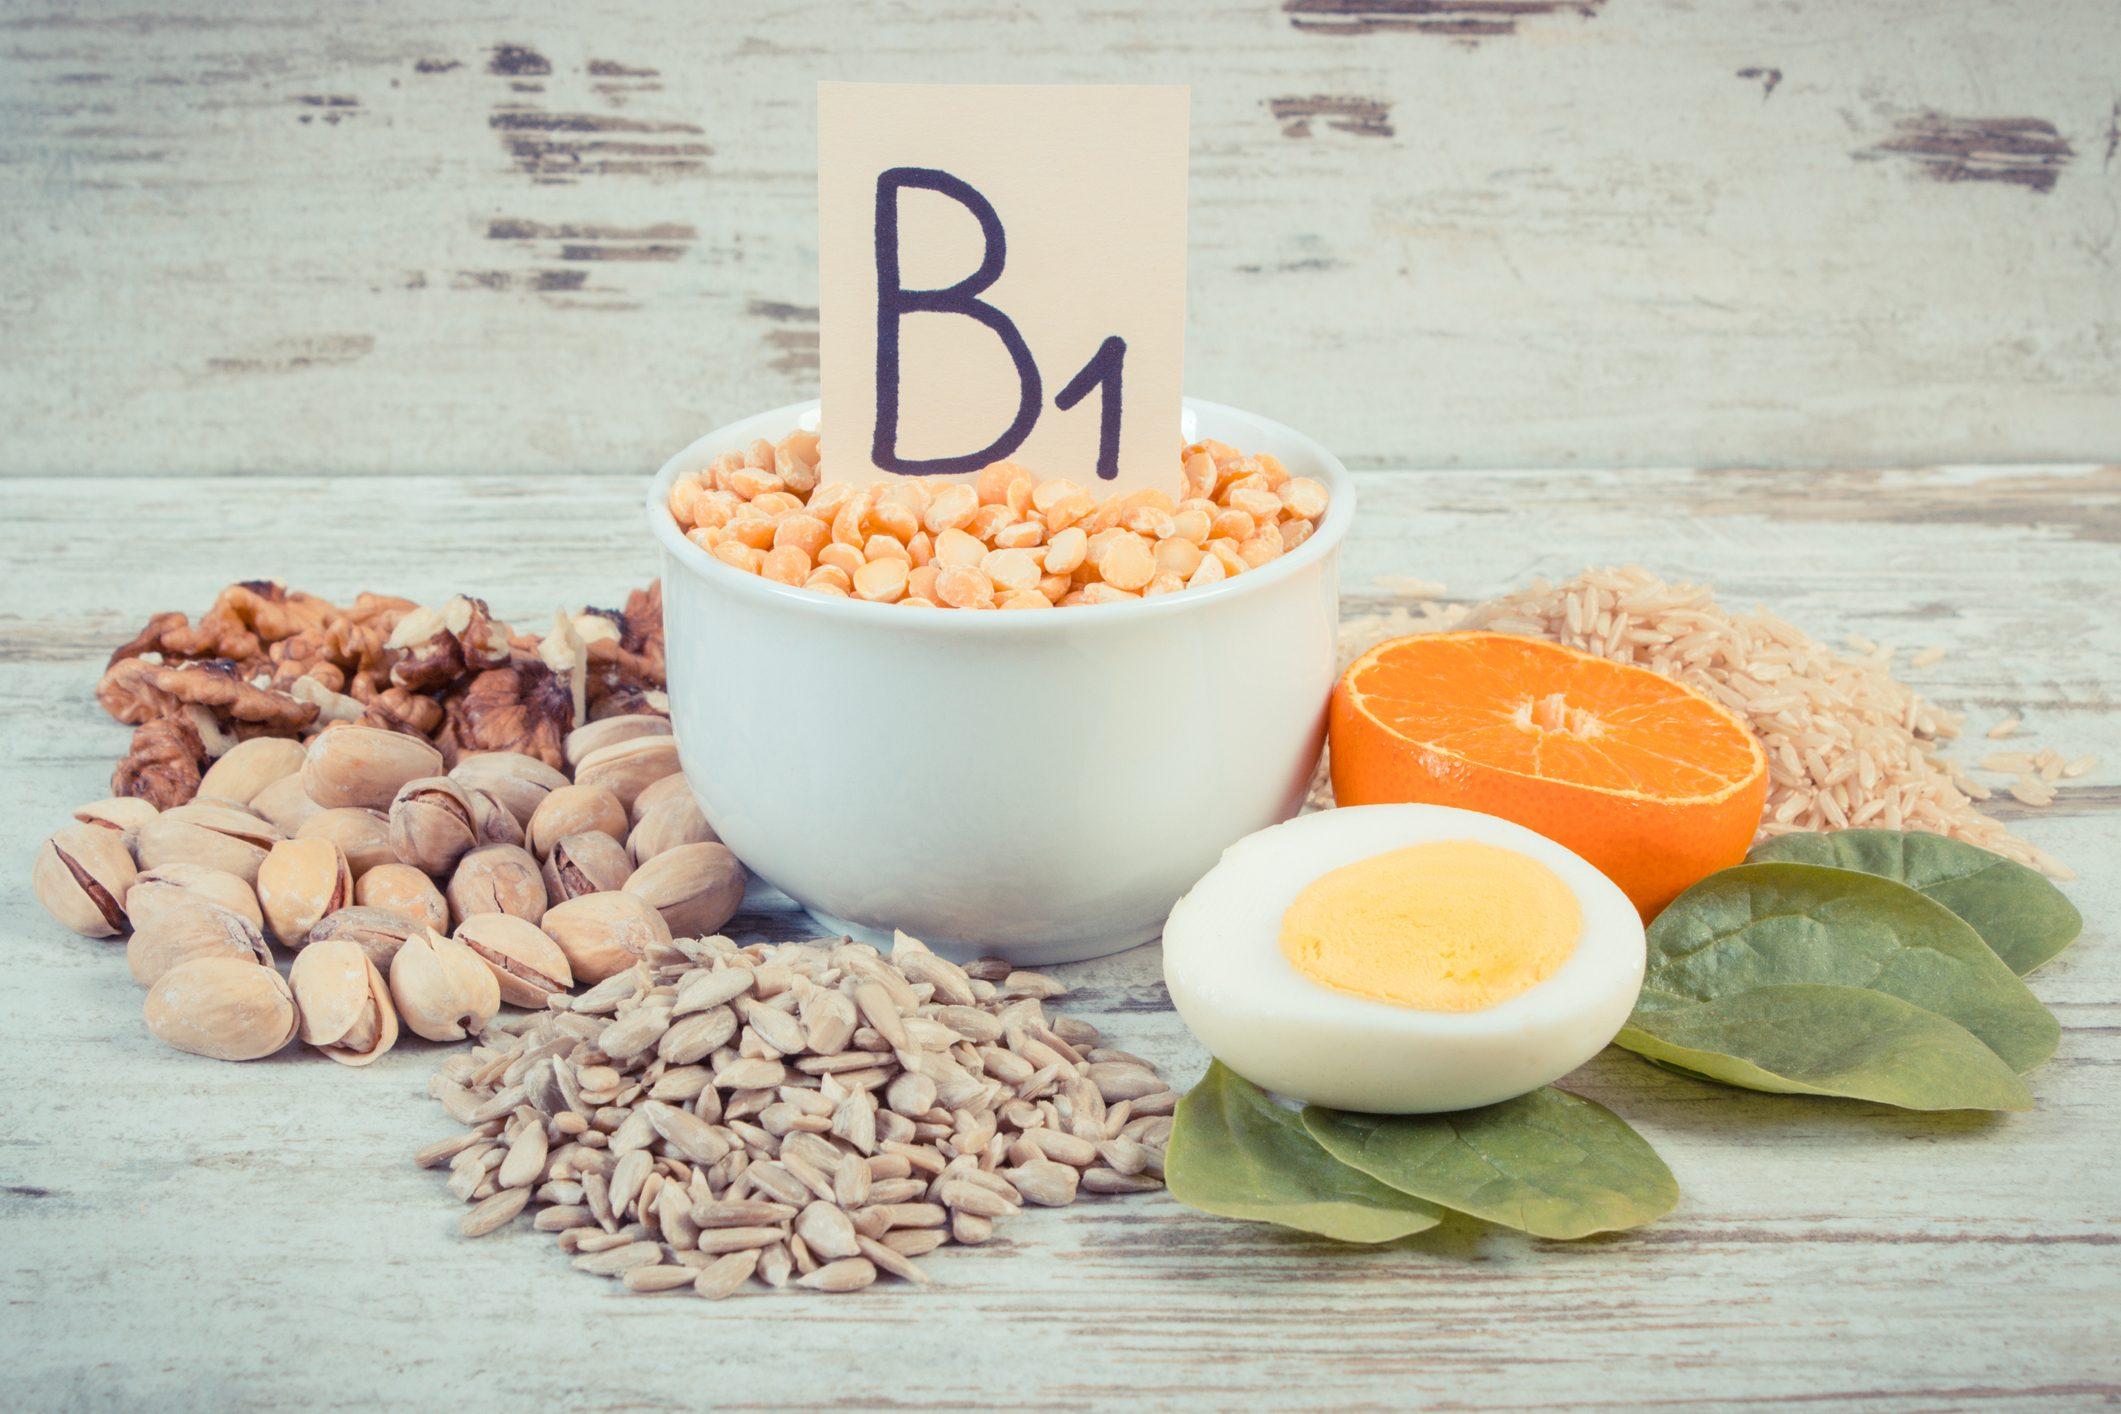 B1 (تیامین) در مکمل های ویتامین ب کمپلکس